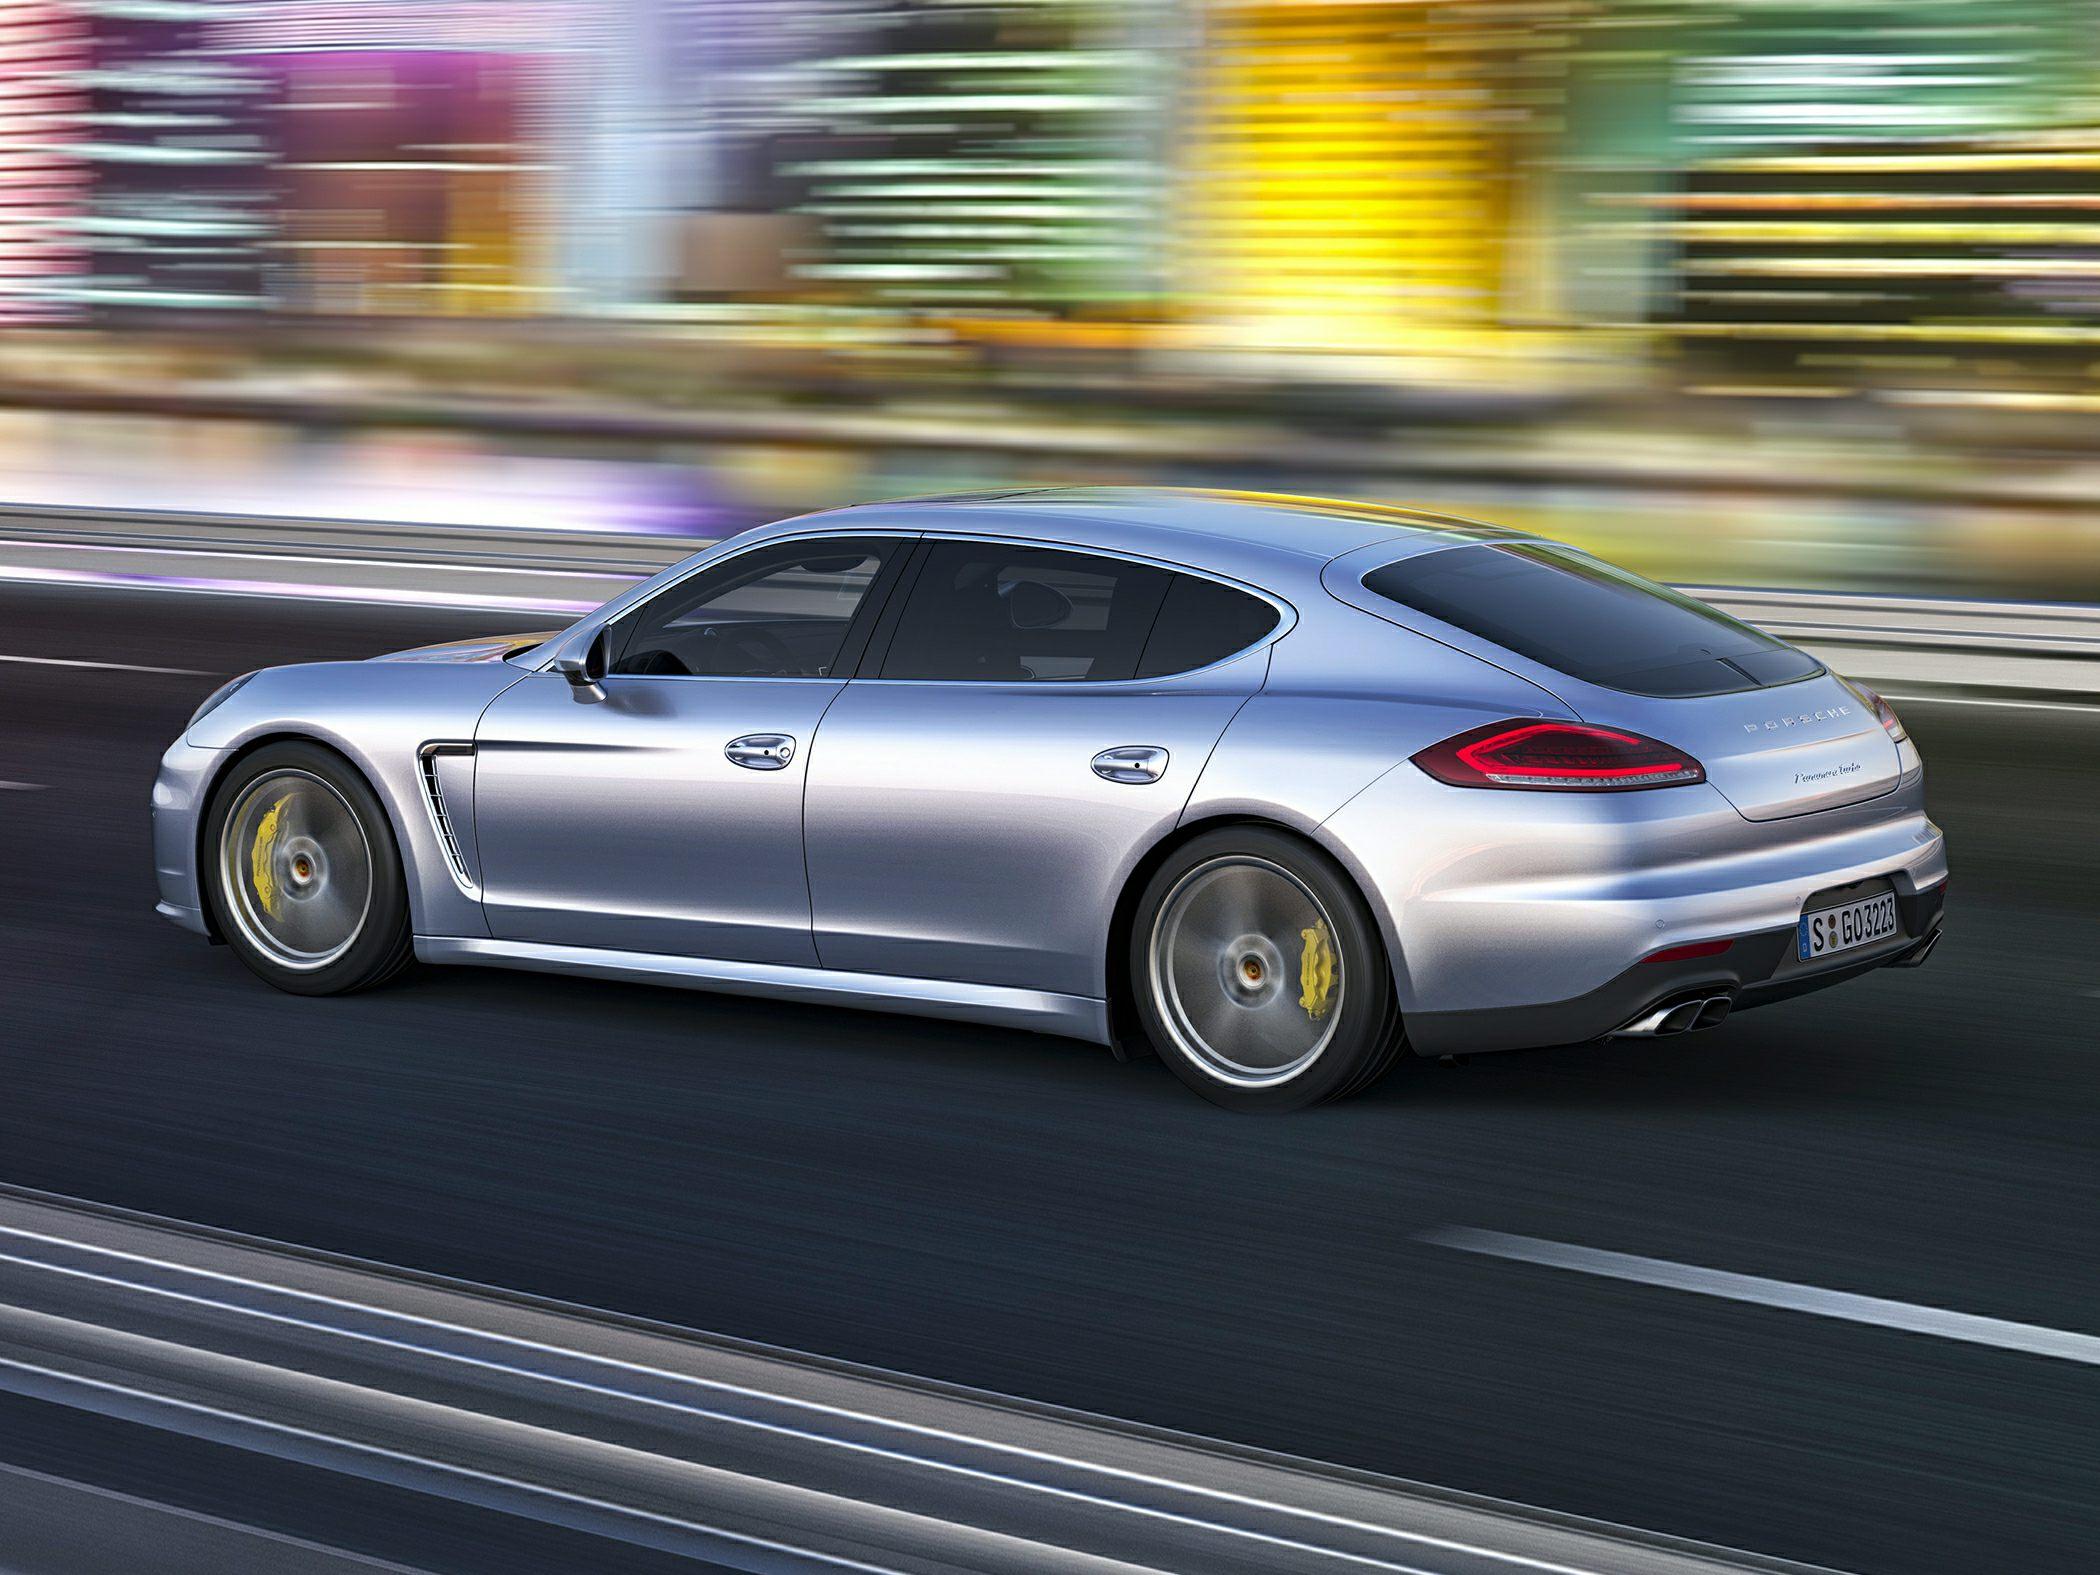 2014 Porsche Panamera Glam2